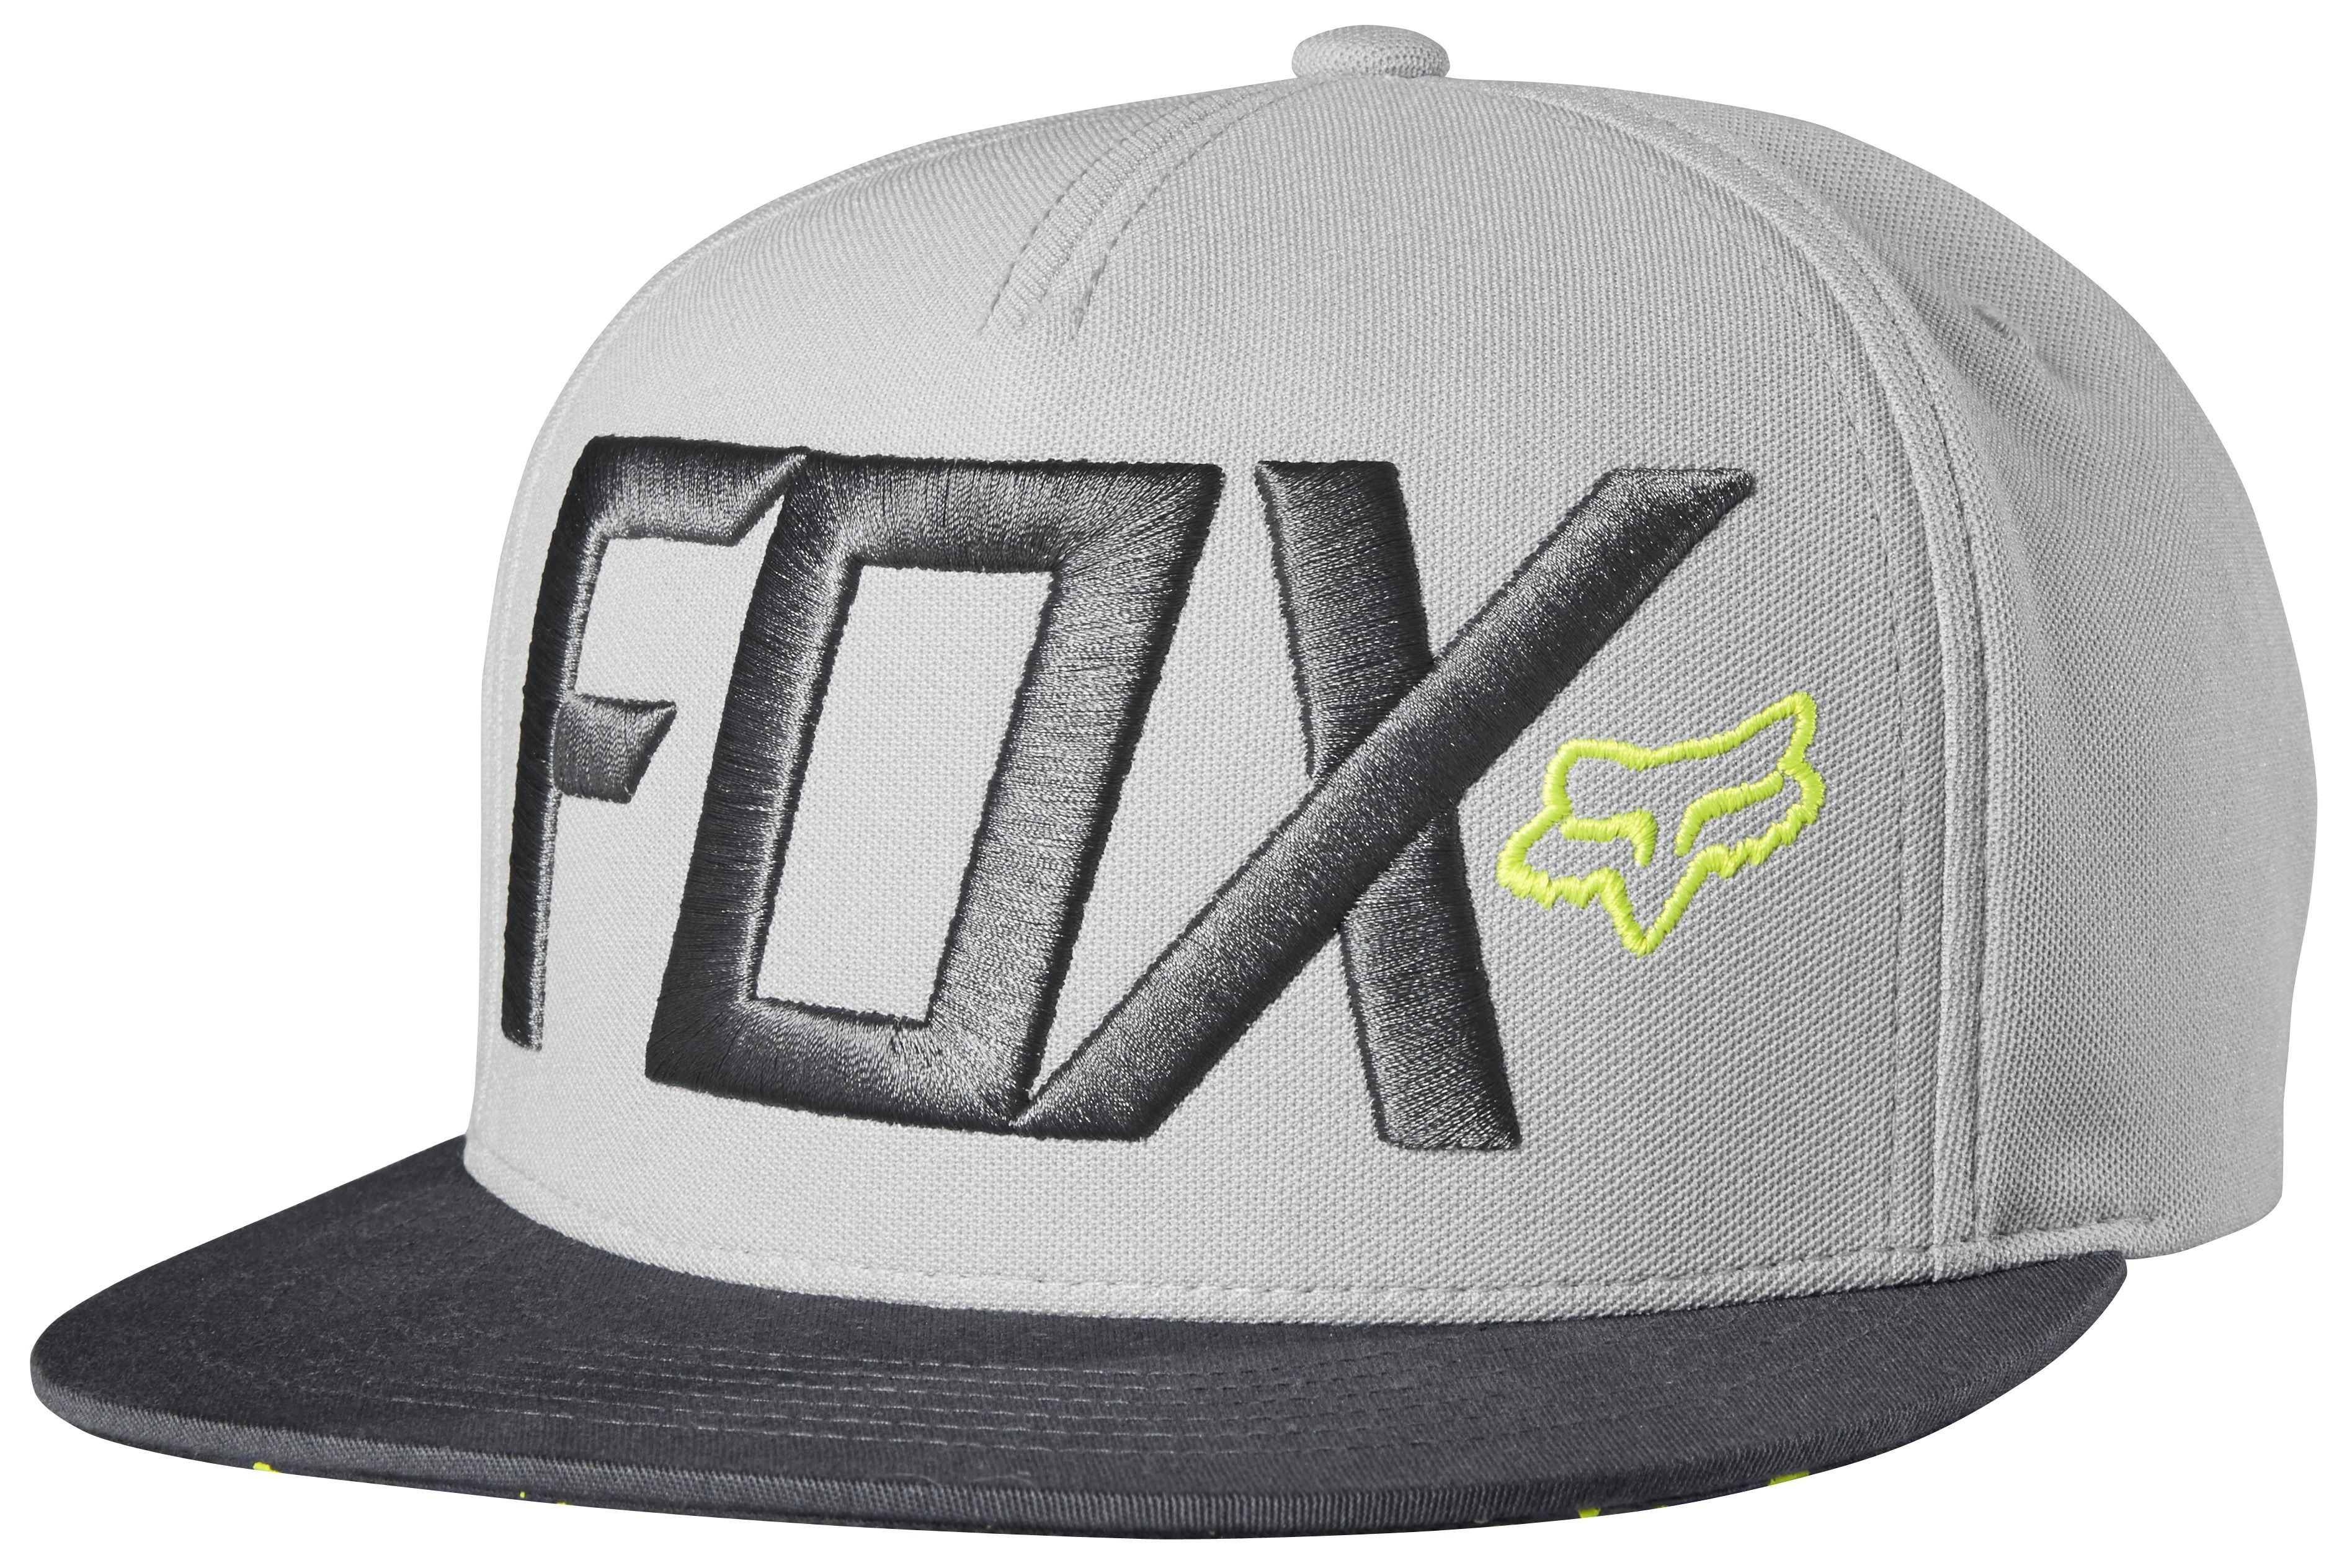 Fox Racing Kroma LE Snapback Hat - RevZilla 0526b0267d55